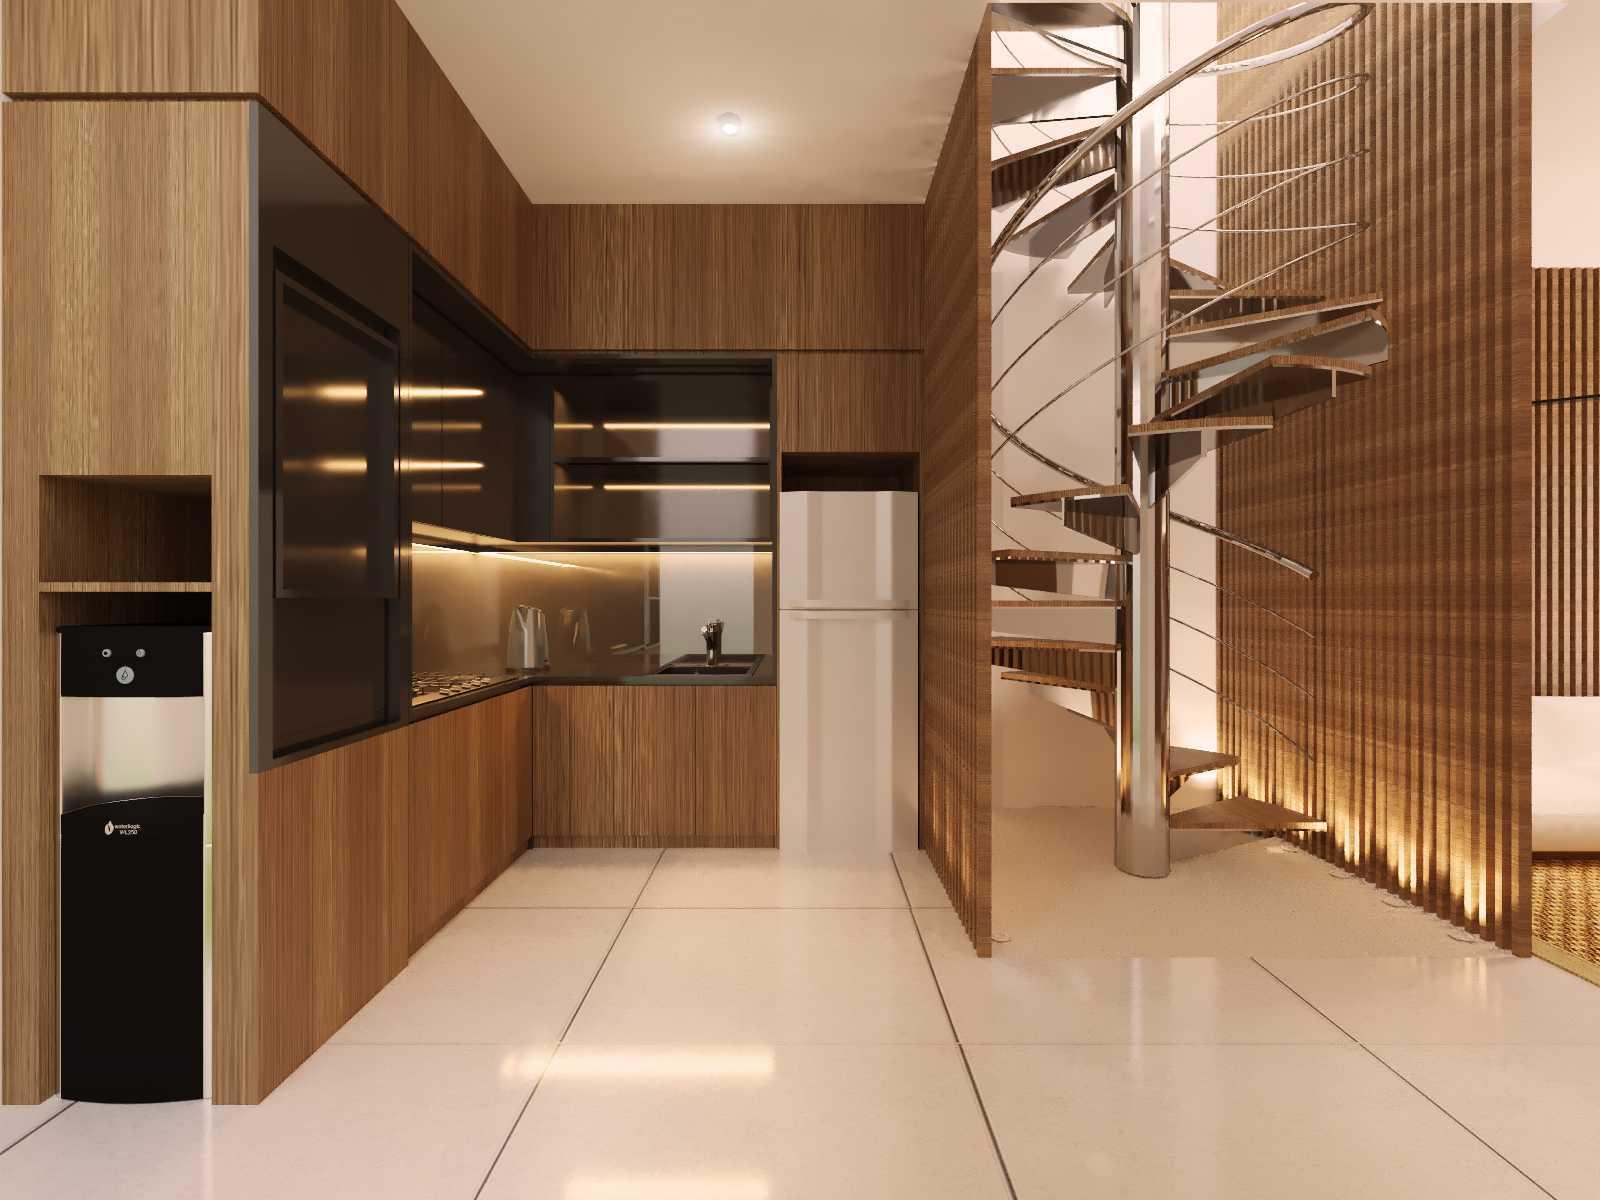 Mitrasasana - Design & Build Yg House Bekasi, Kota Bks, Jawa Barat, Indonesia Bekasi, Kota Bks, Jawa Barat, Indonesia Mitrasasana-Design-Build-Yg-House   78698